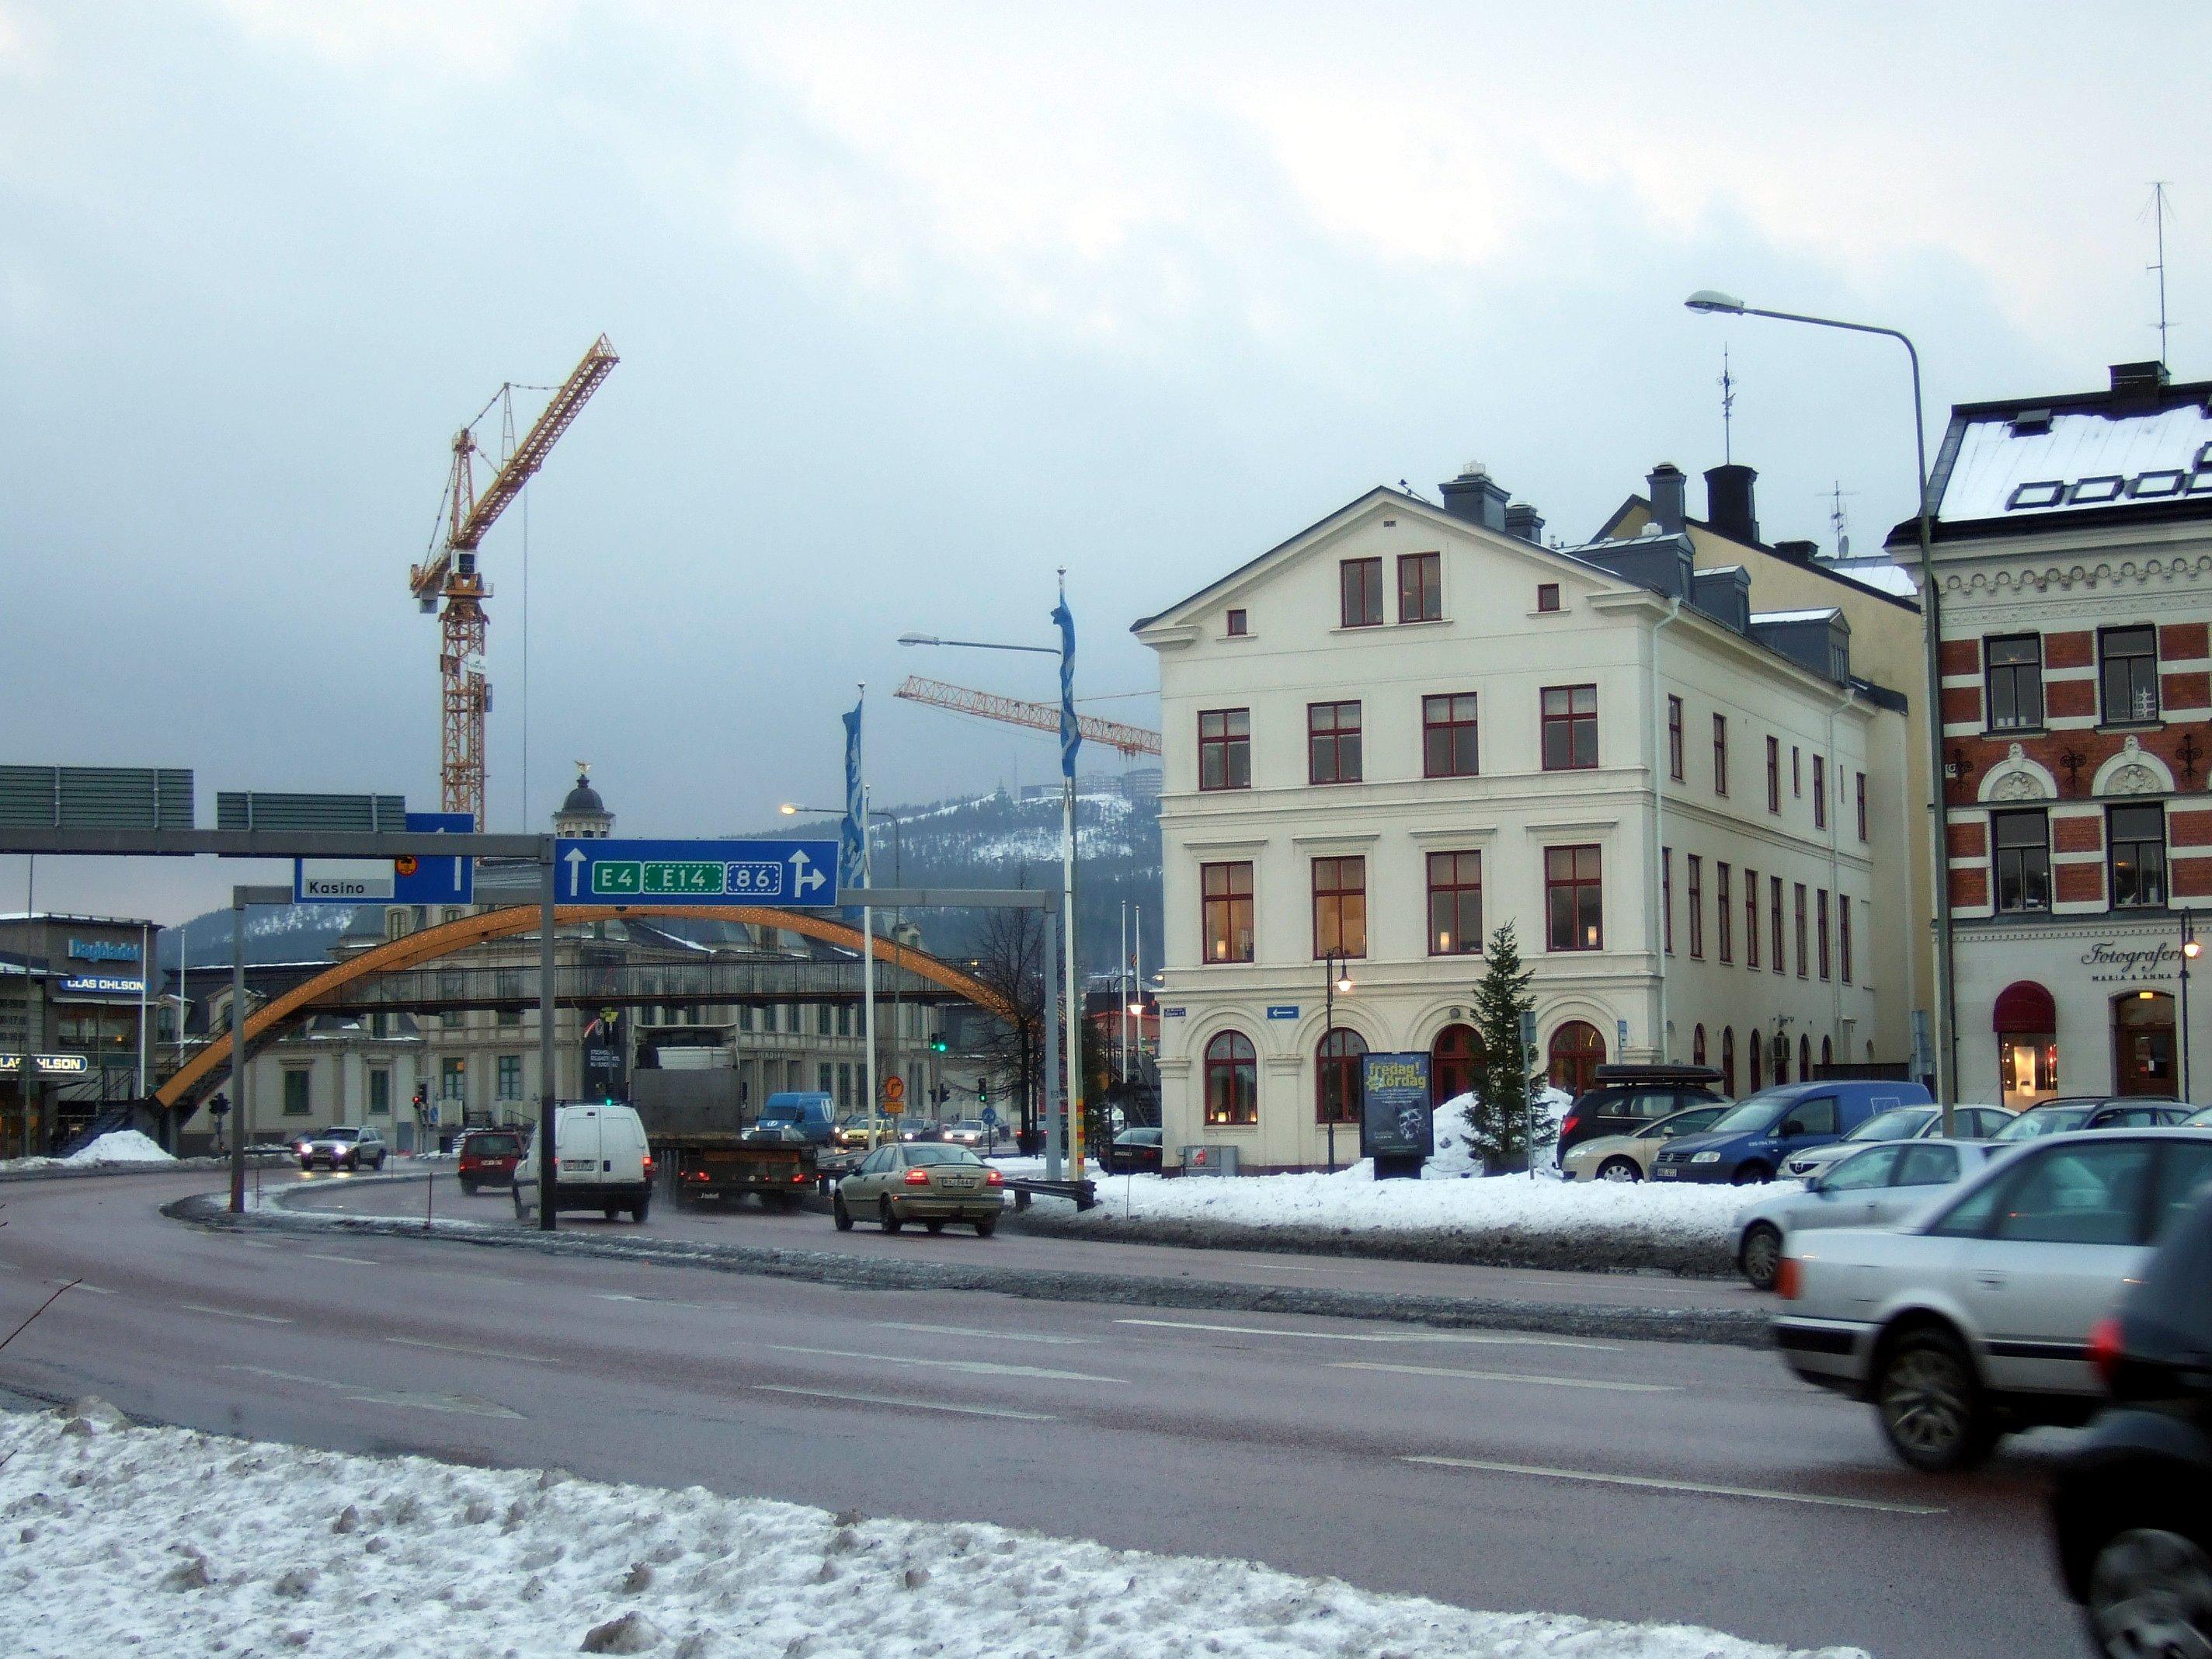 escorttjej sundsvall city stockholm